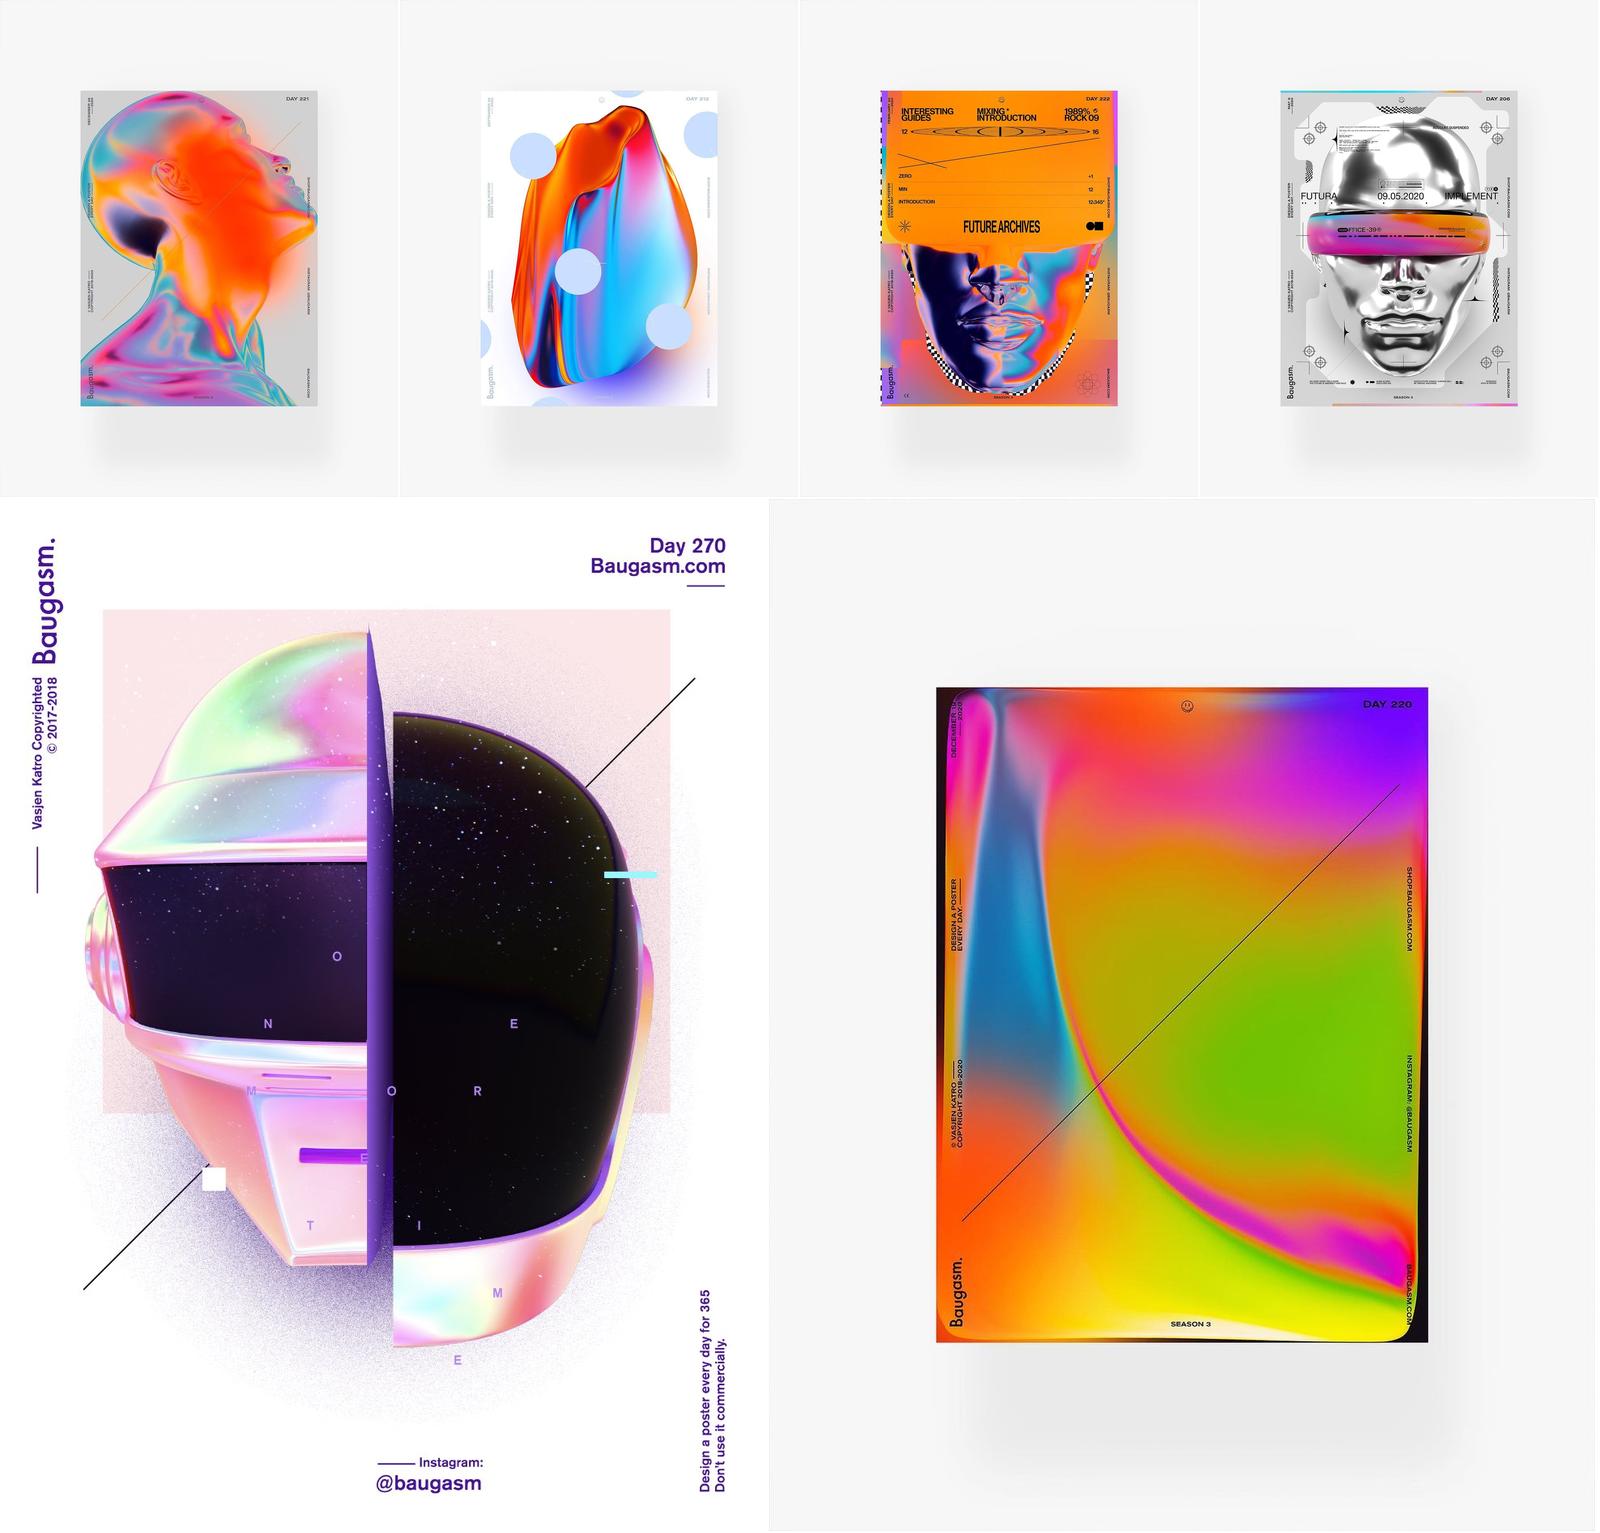 Baugasm-NFT-Collage